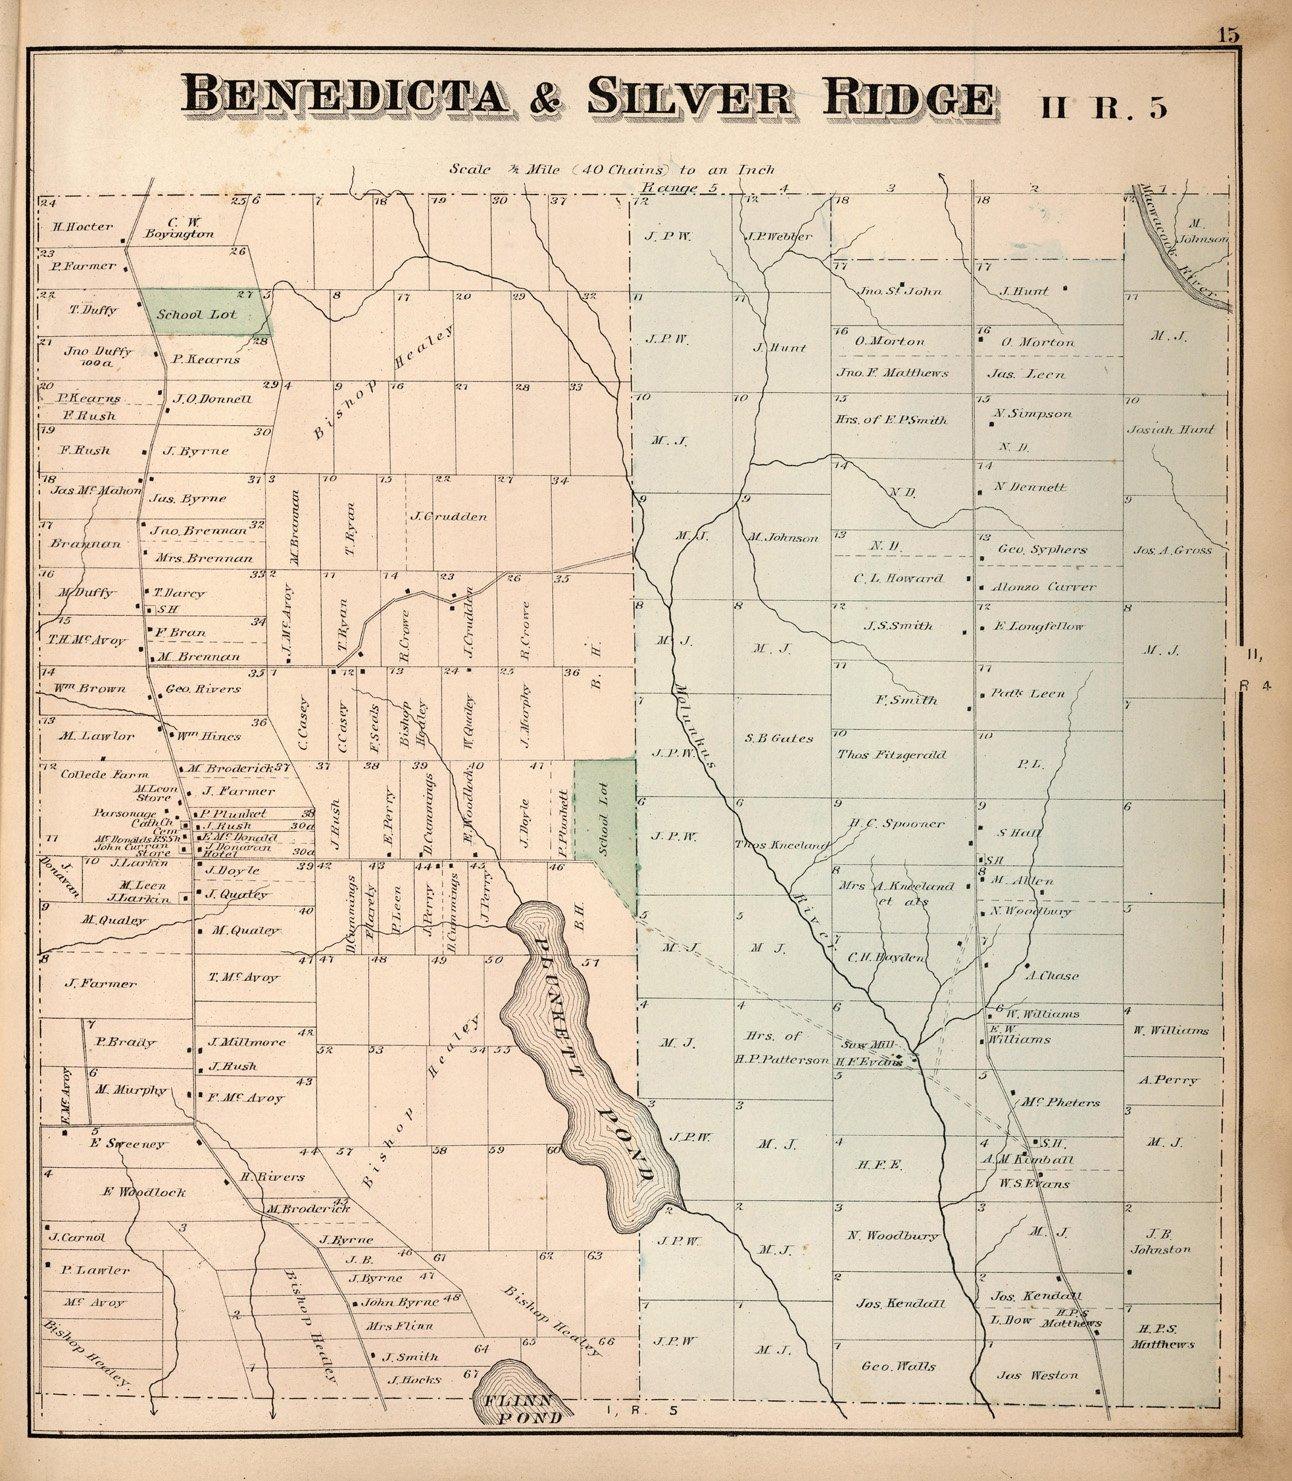 Amazon Com Map Poster Benedicta Silver Ridge Ii R 5 Aroostook